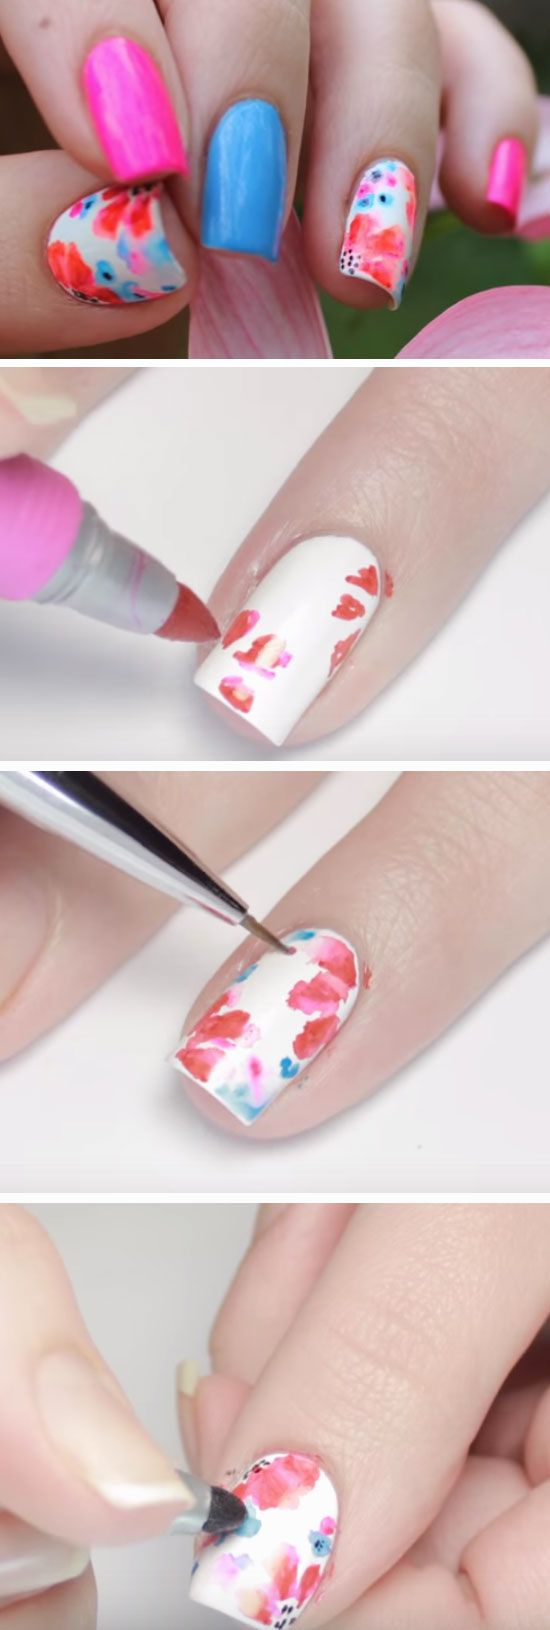 23 Easy Summer Nail Art For Short Nails Pinterest Sharpie Nails